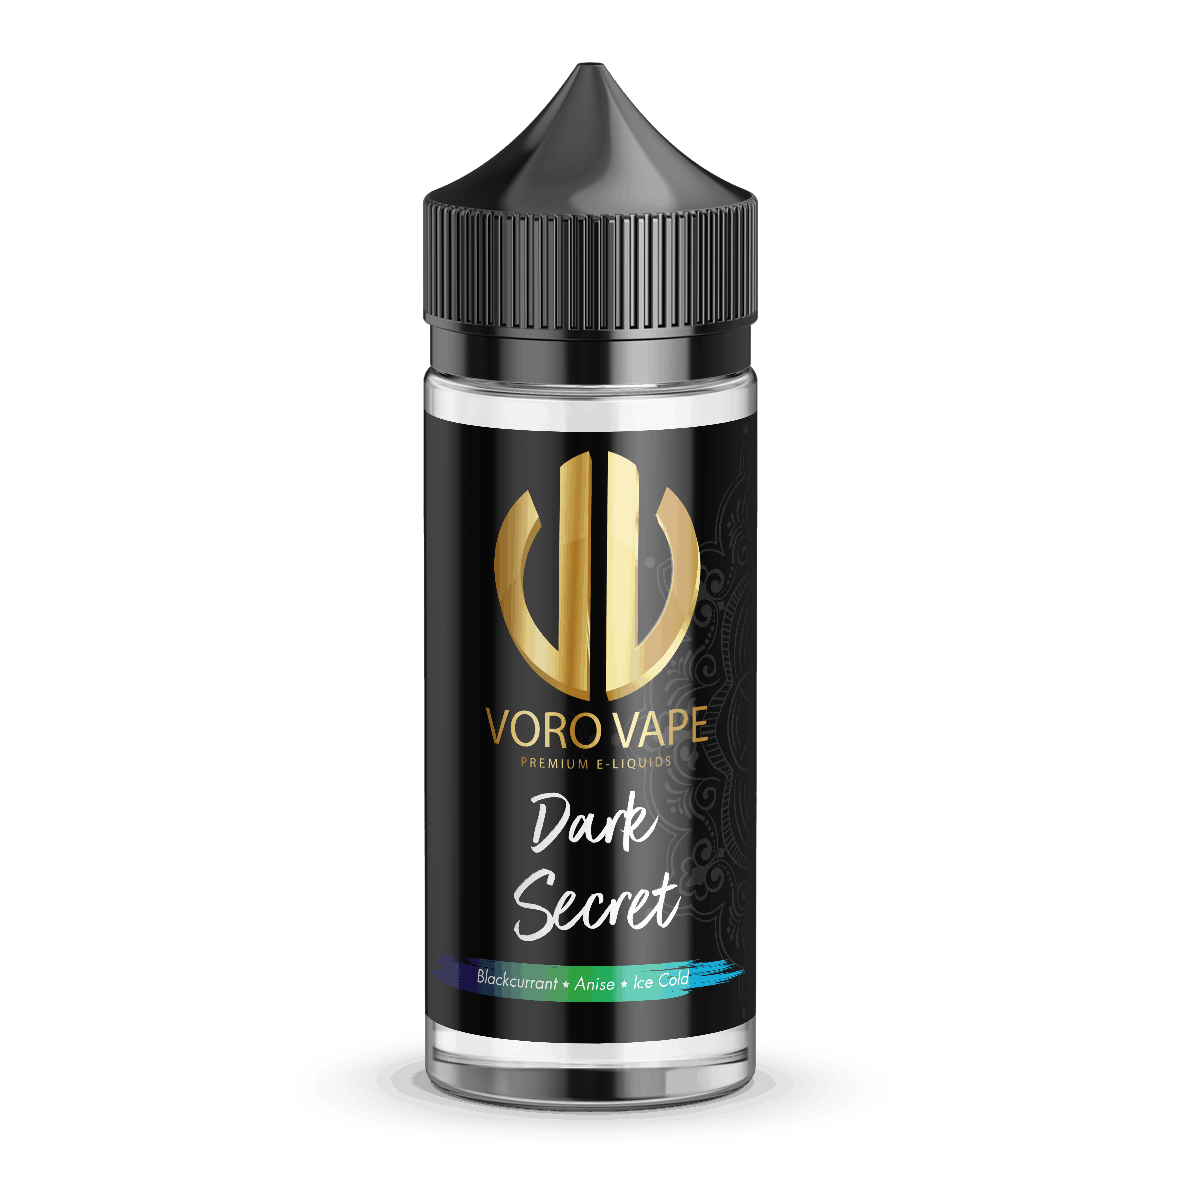 Voro Vape 100ml Dark Secret 525x525 - Dark Secret E-Liquid Shortfill by Voro Vape